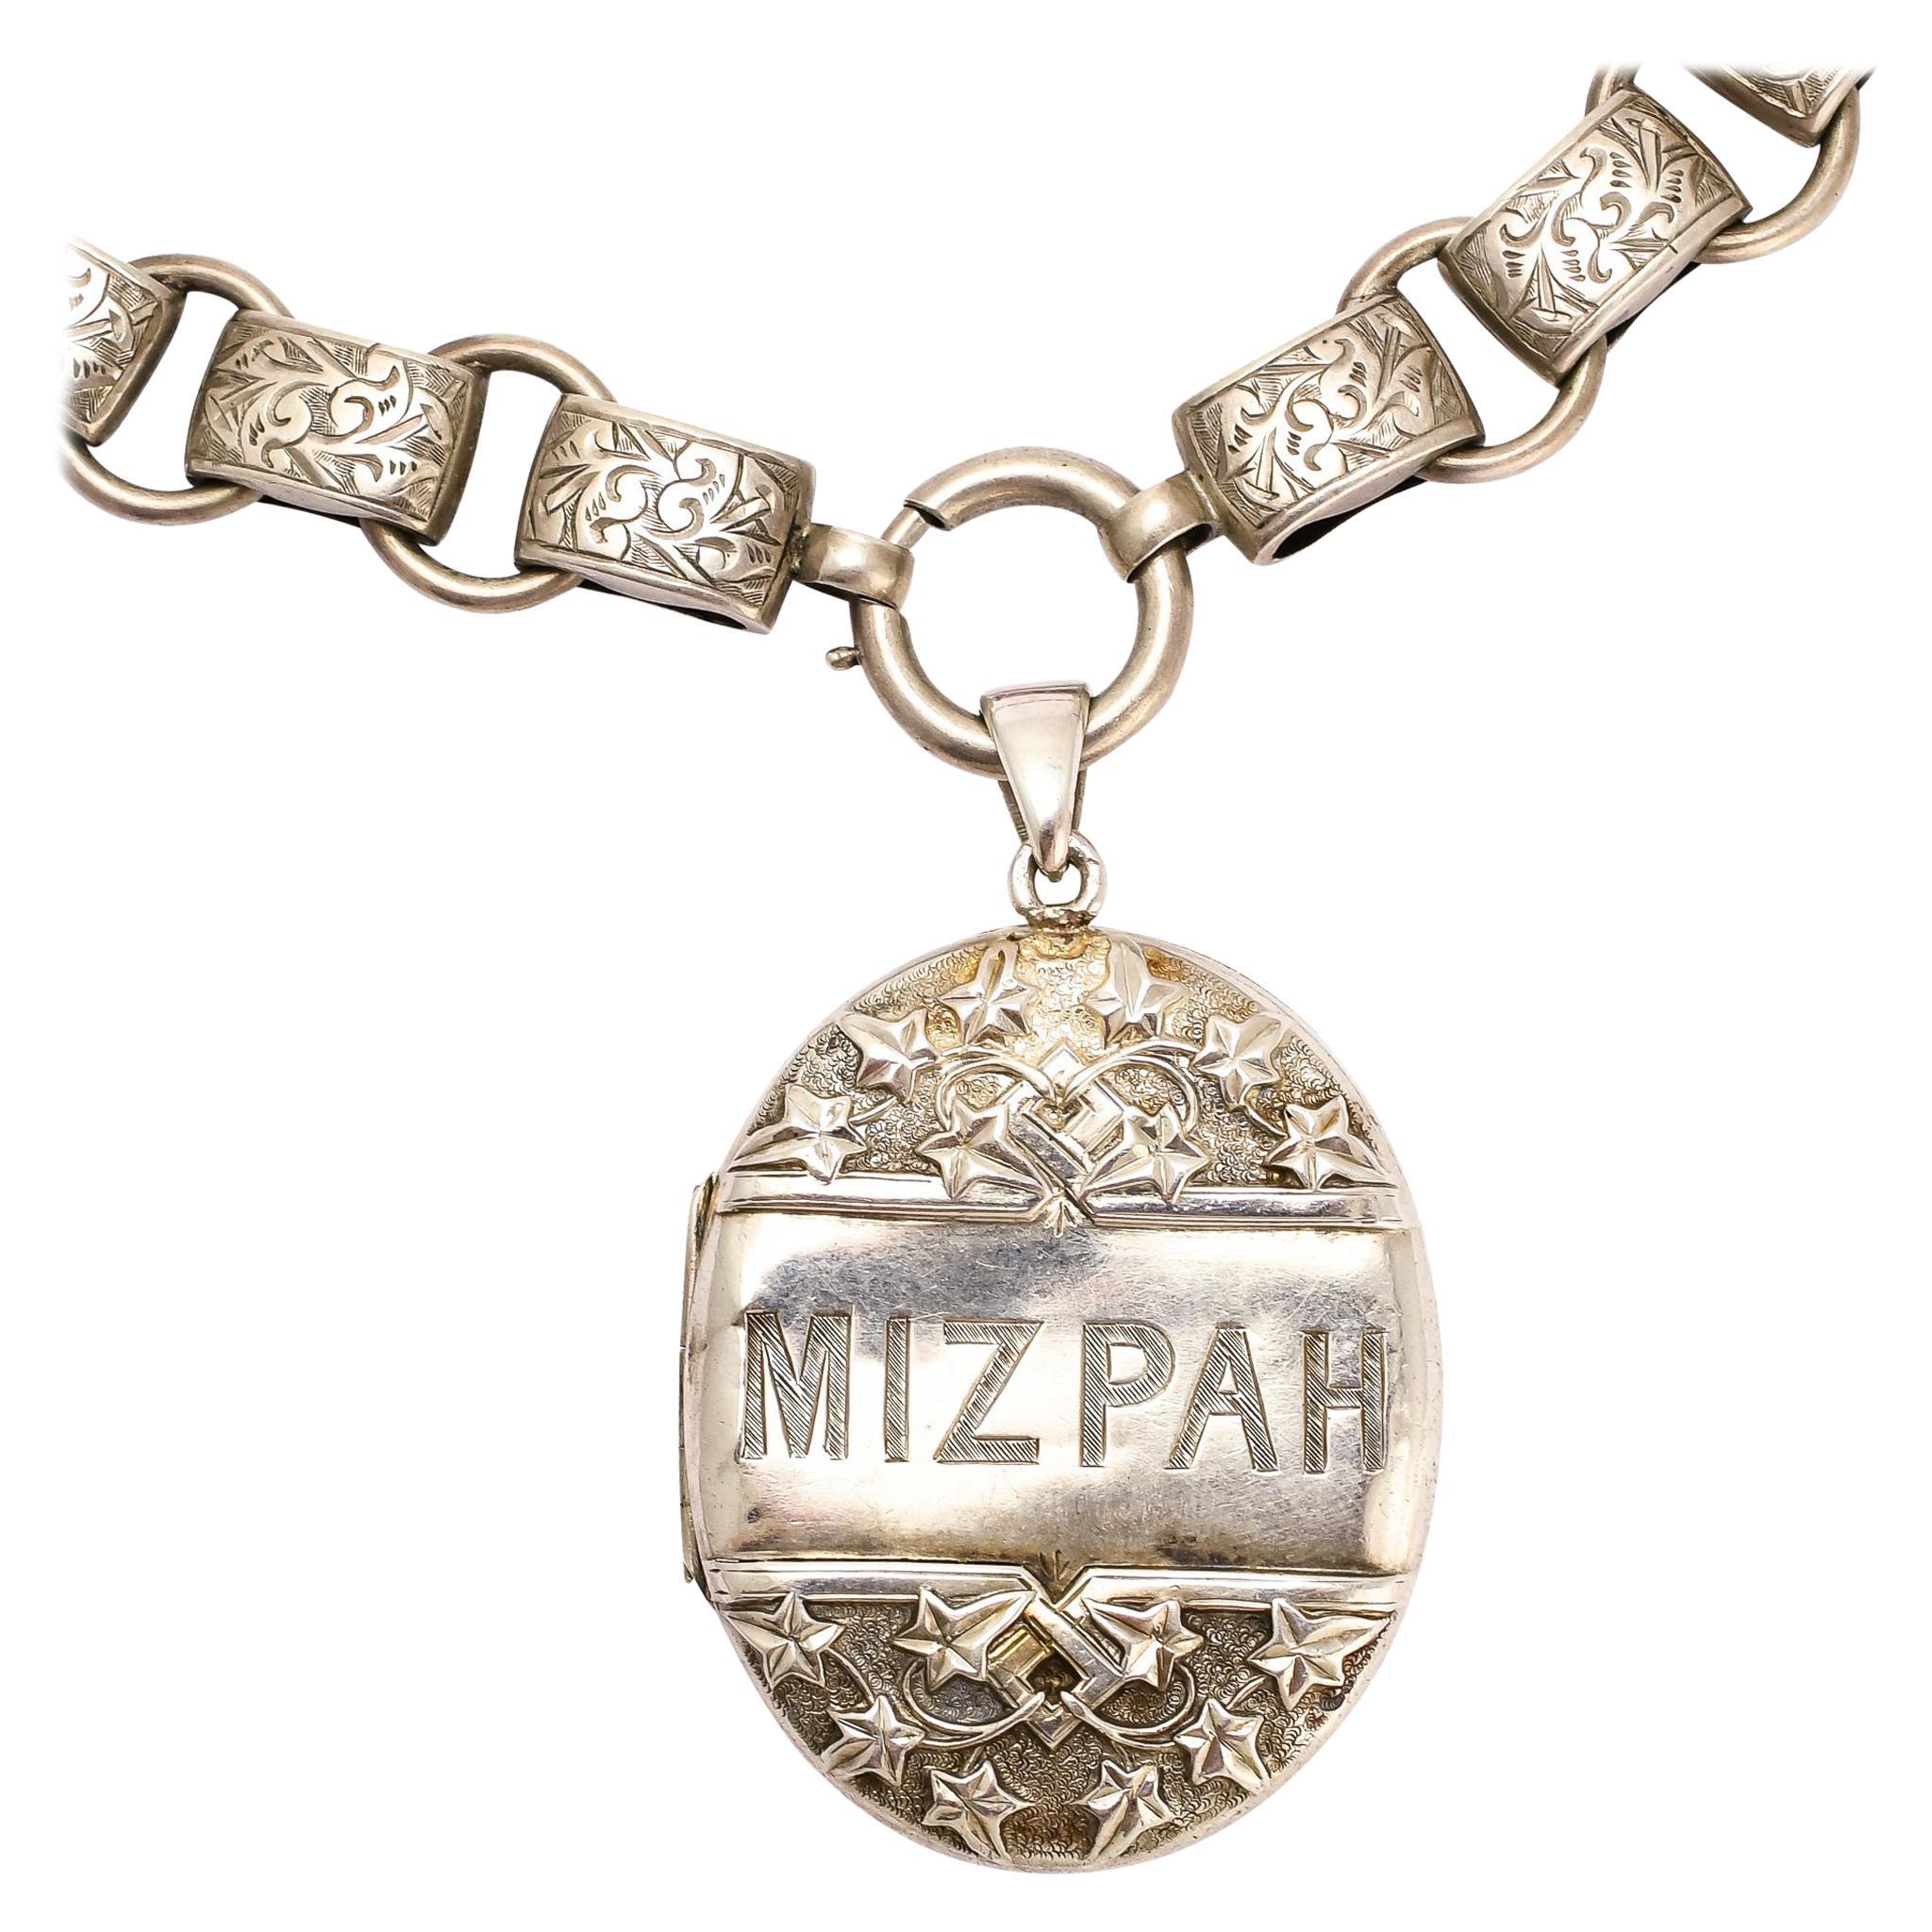 Antique Victorian MIZPAH Silver Locket Collar Necklace